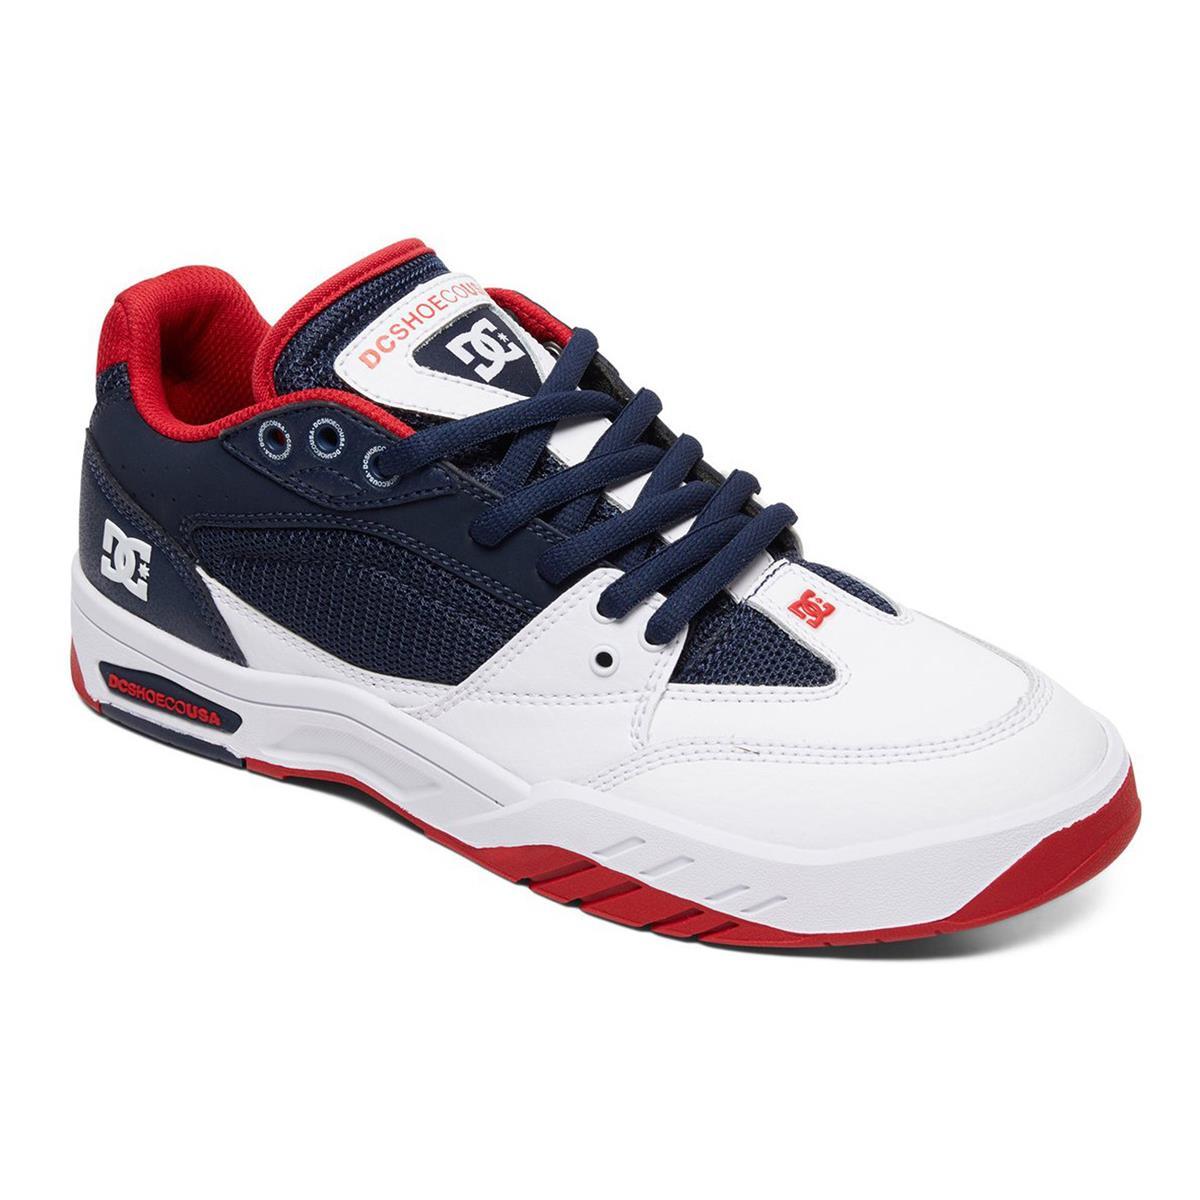 DC Schuhe Maswell Navy/Weiß